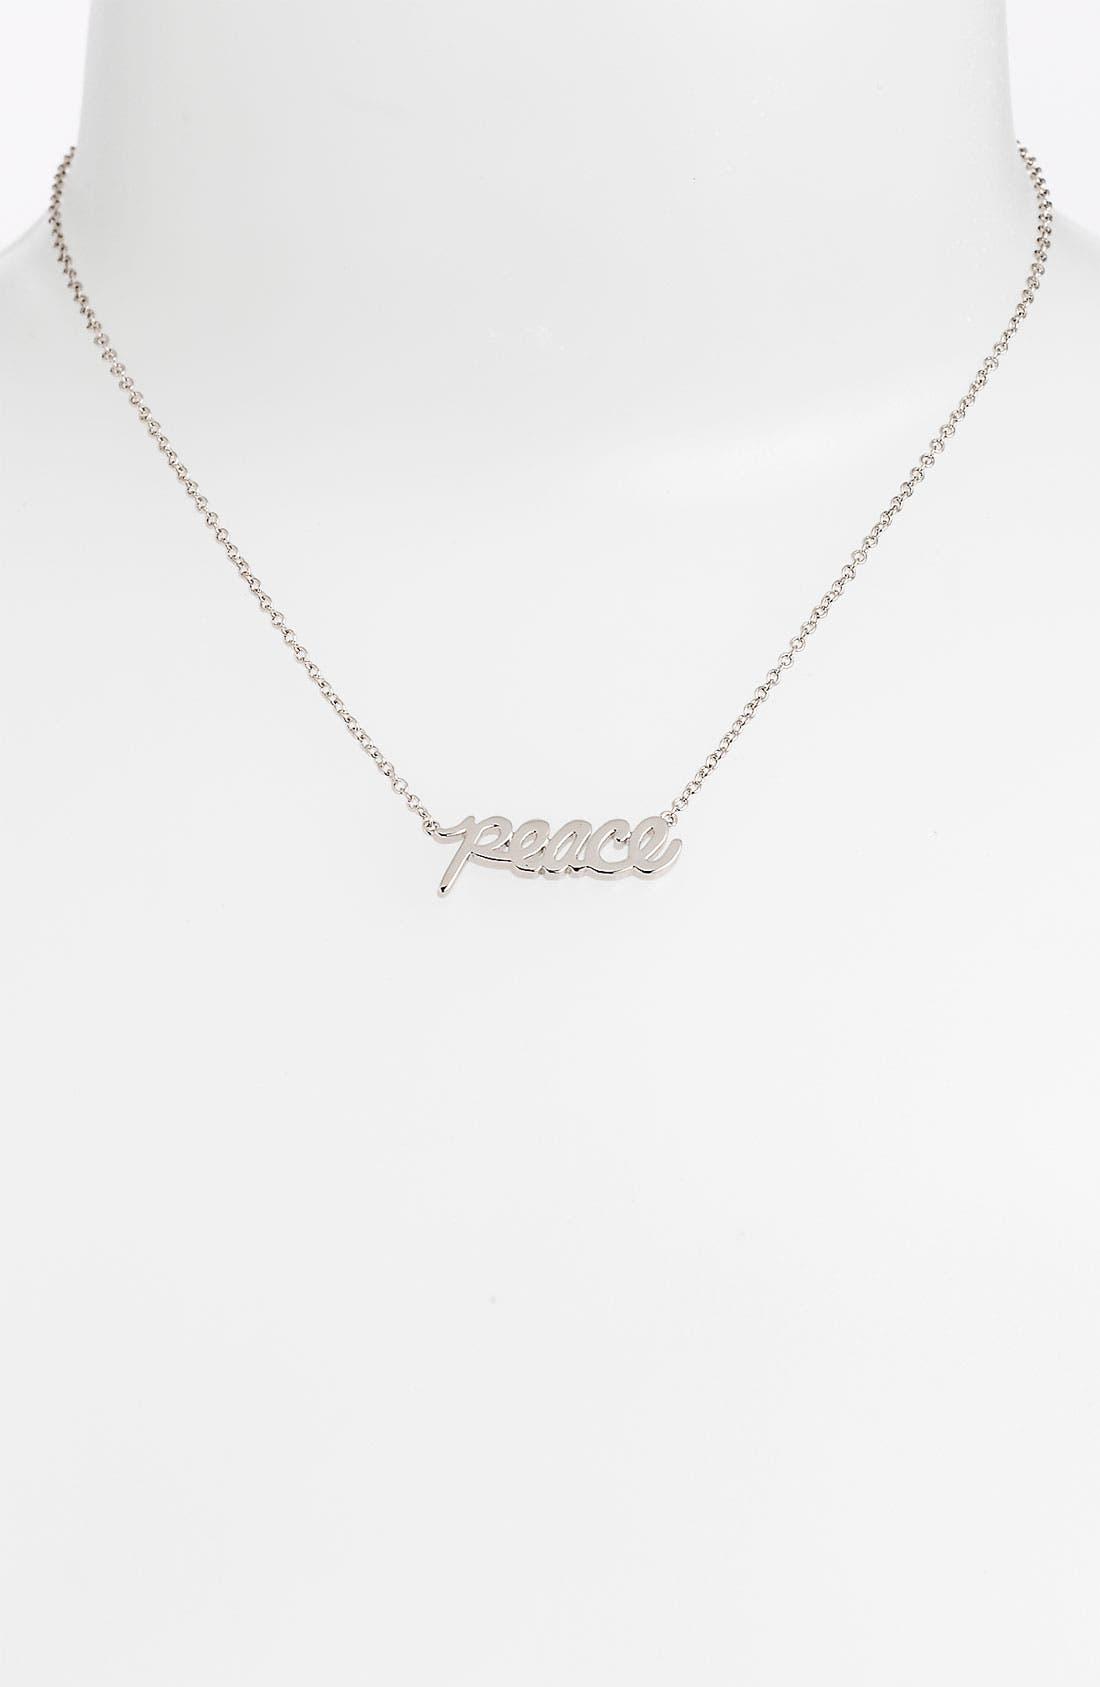 Main Image - Ariella Collection 'Messages - Peace' Script Pendant Necklace (Nordstrom Exclusive)